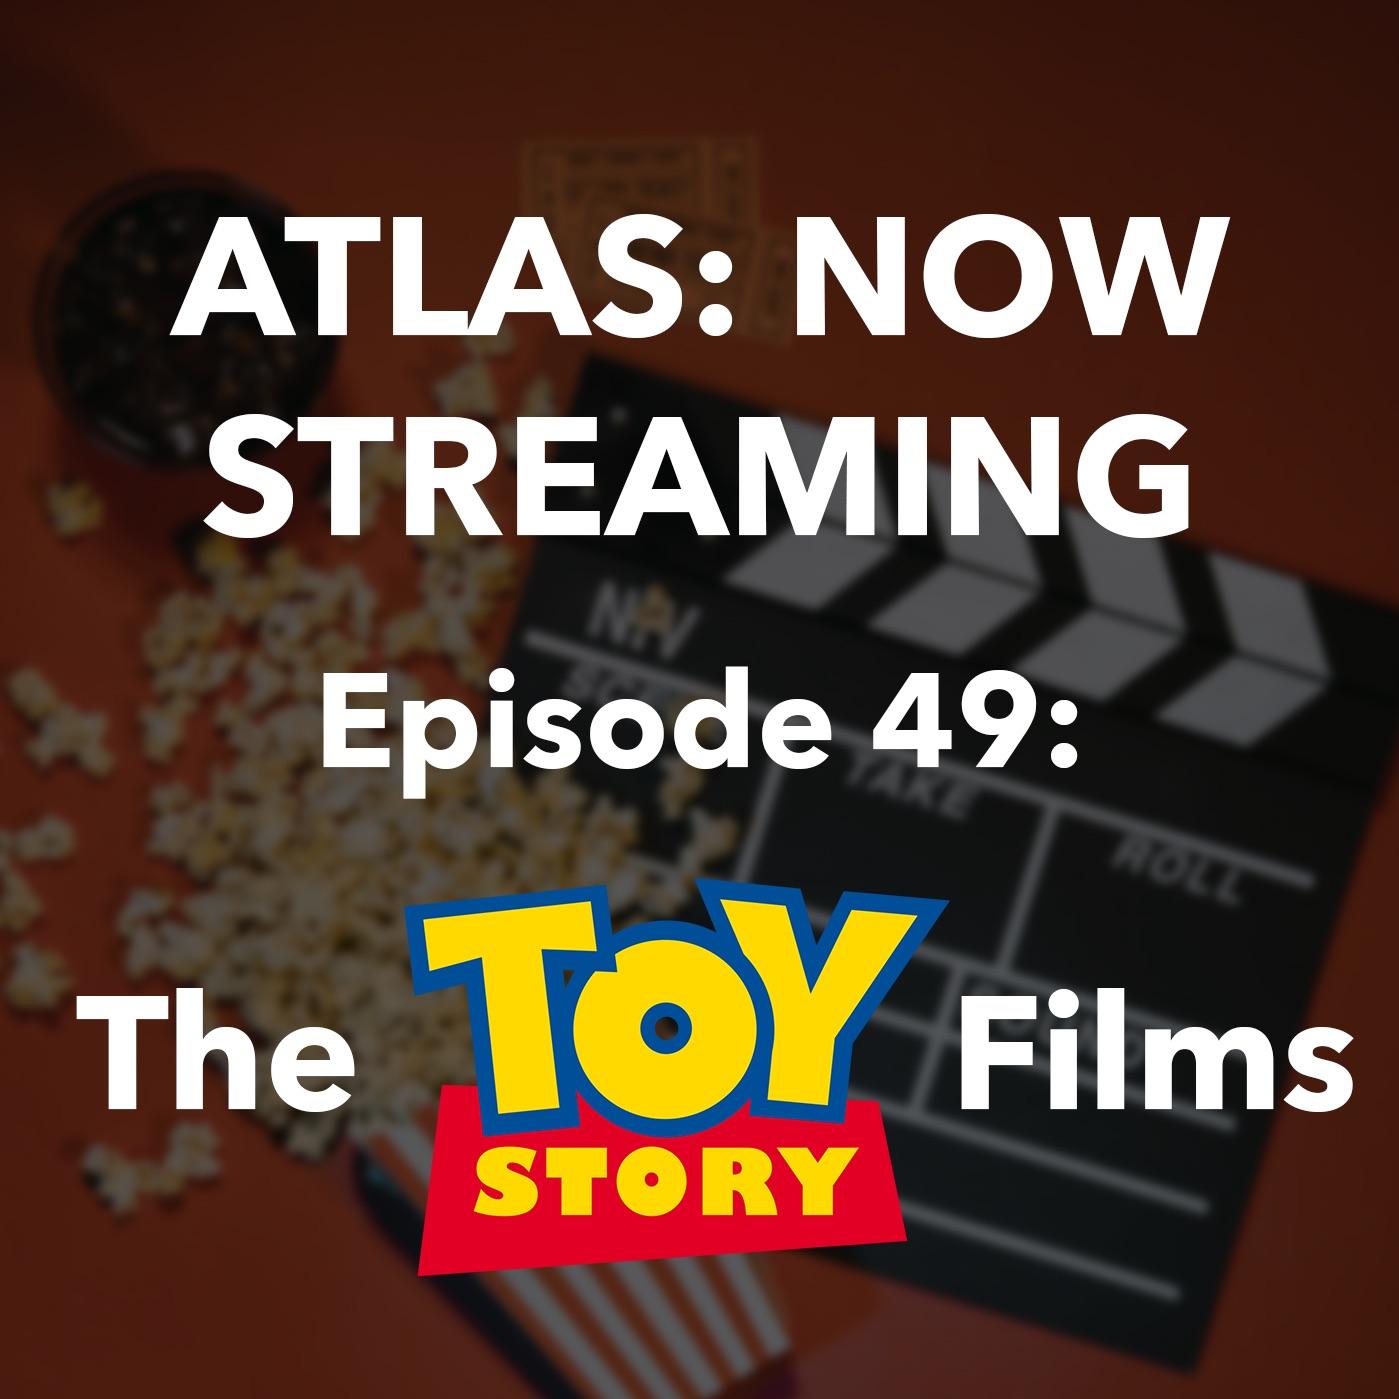 The Toy Story Saga - Atlas: Now Streaming Episode 49